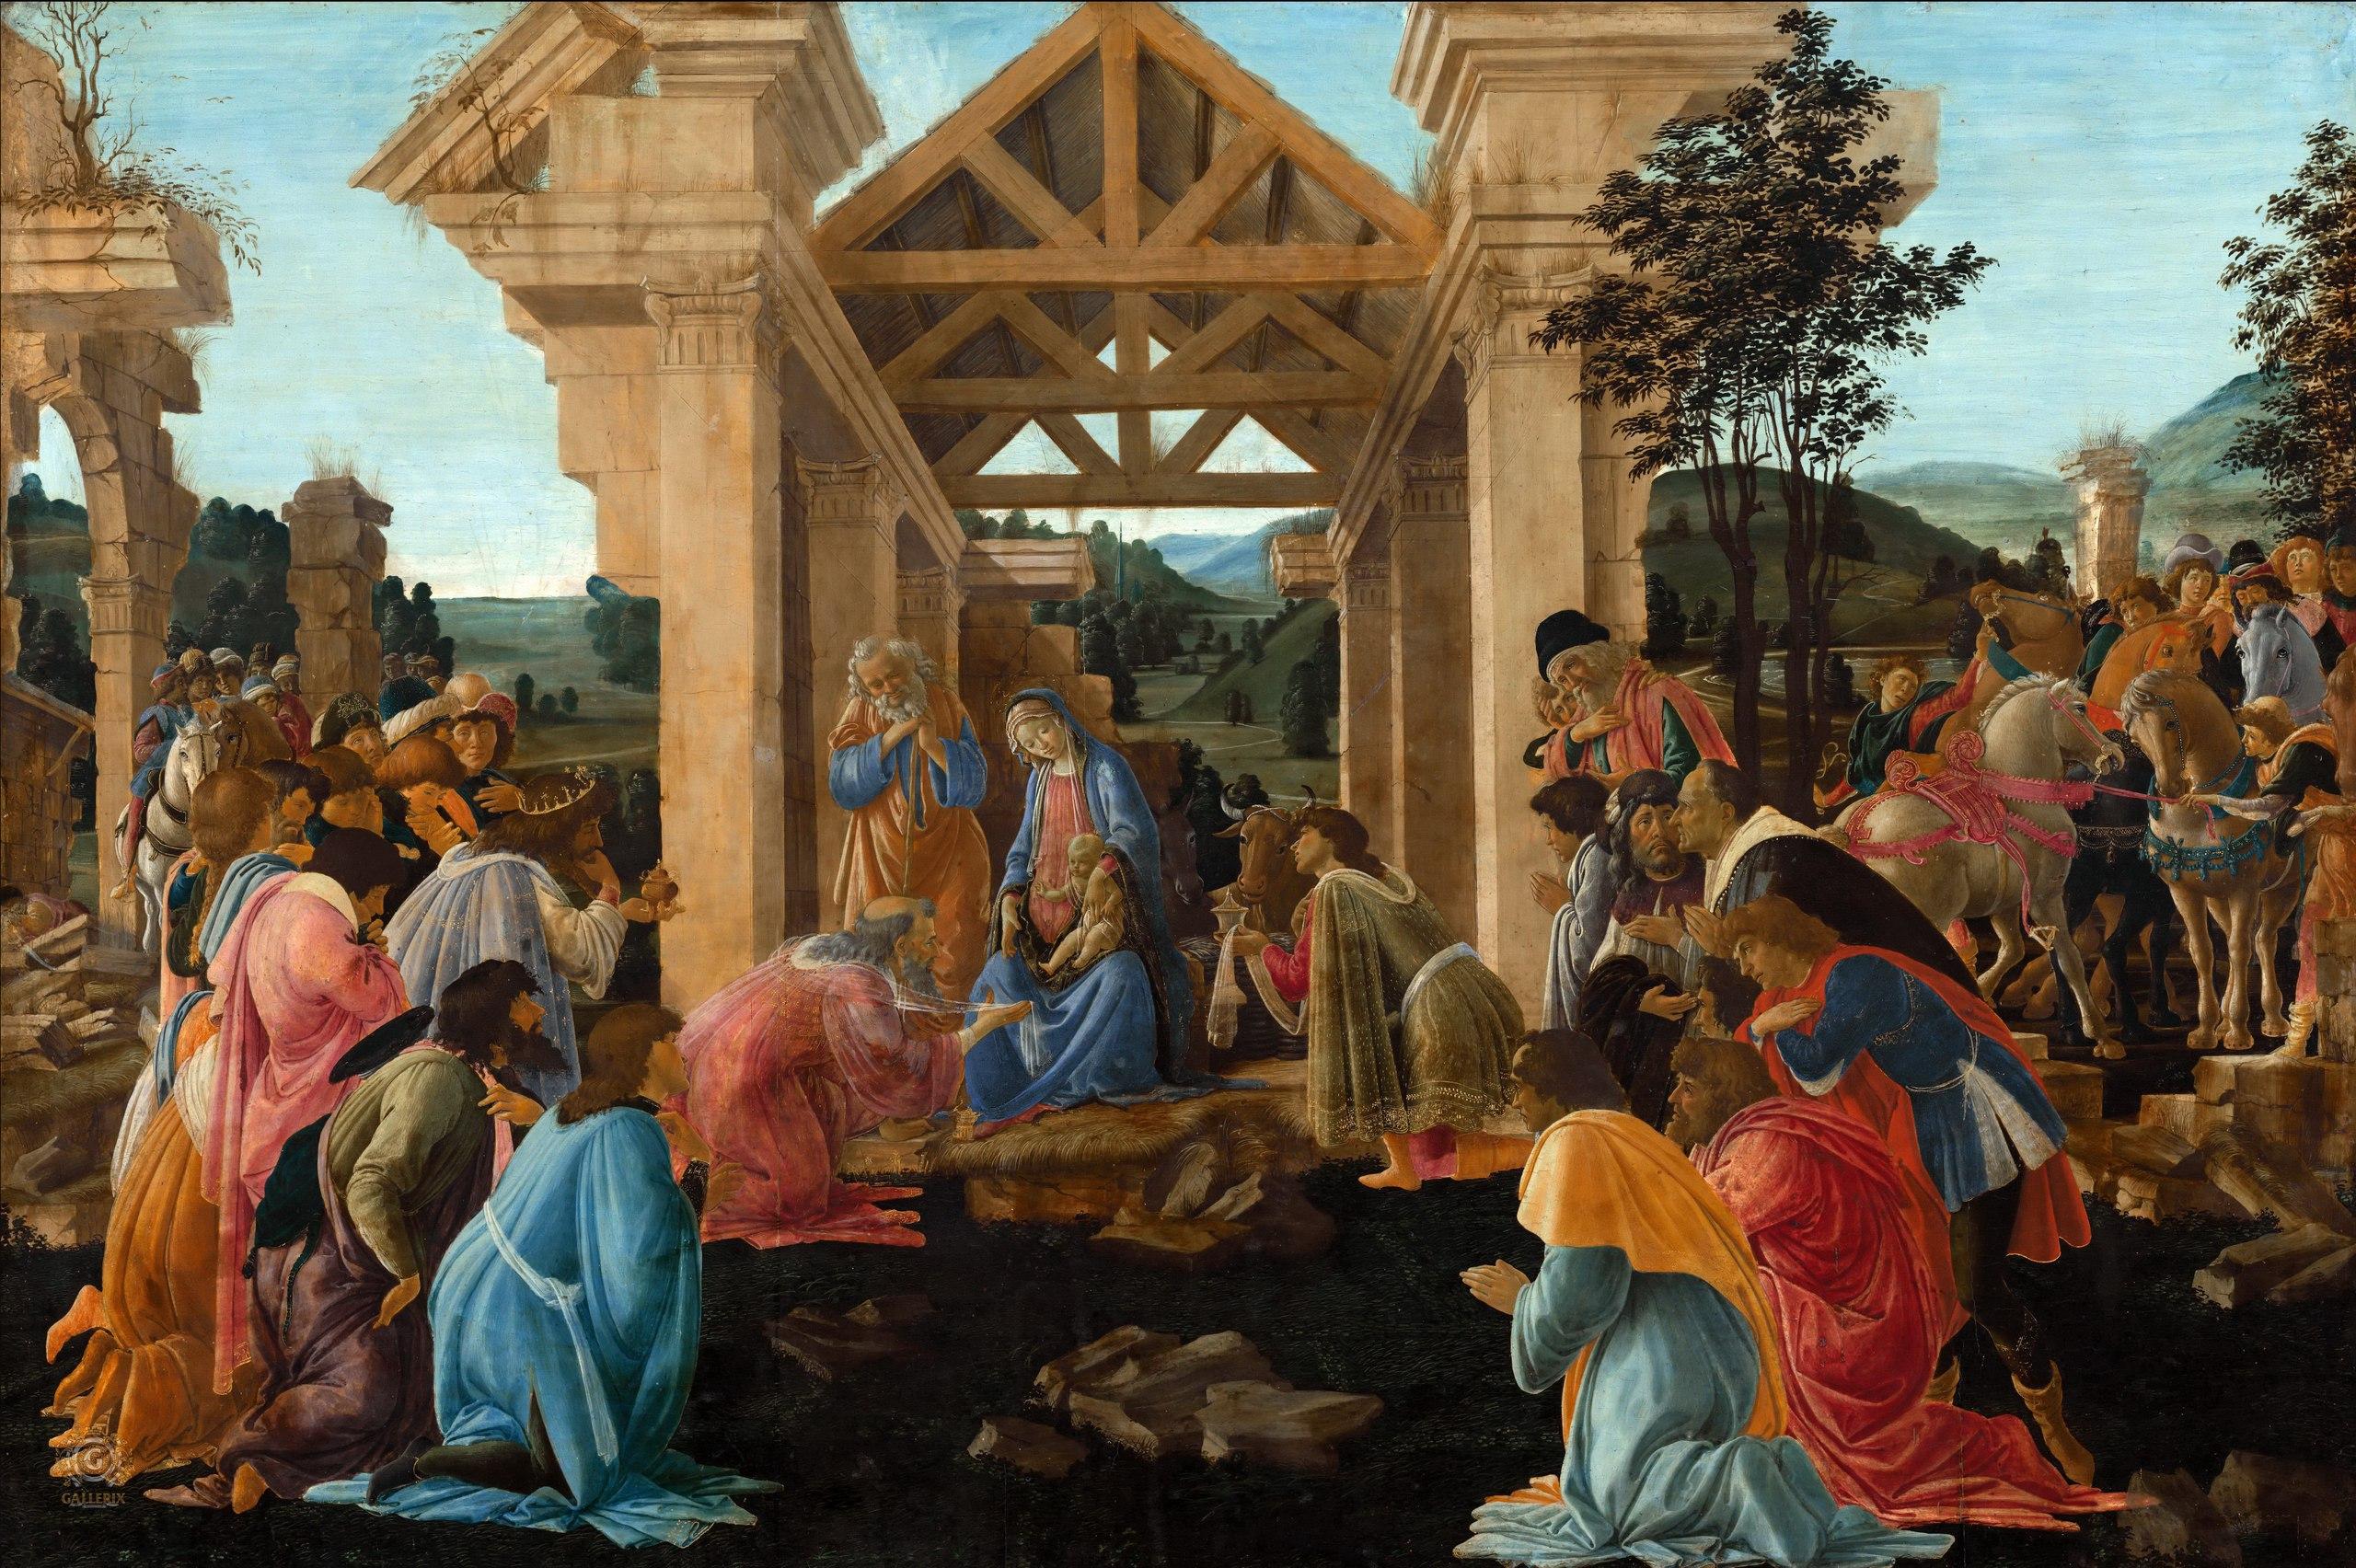 Сандро Боттичелли (1445-1510). Часть 1